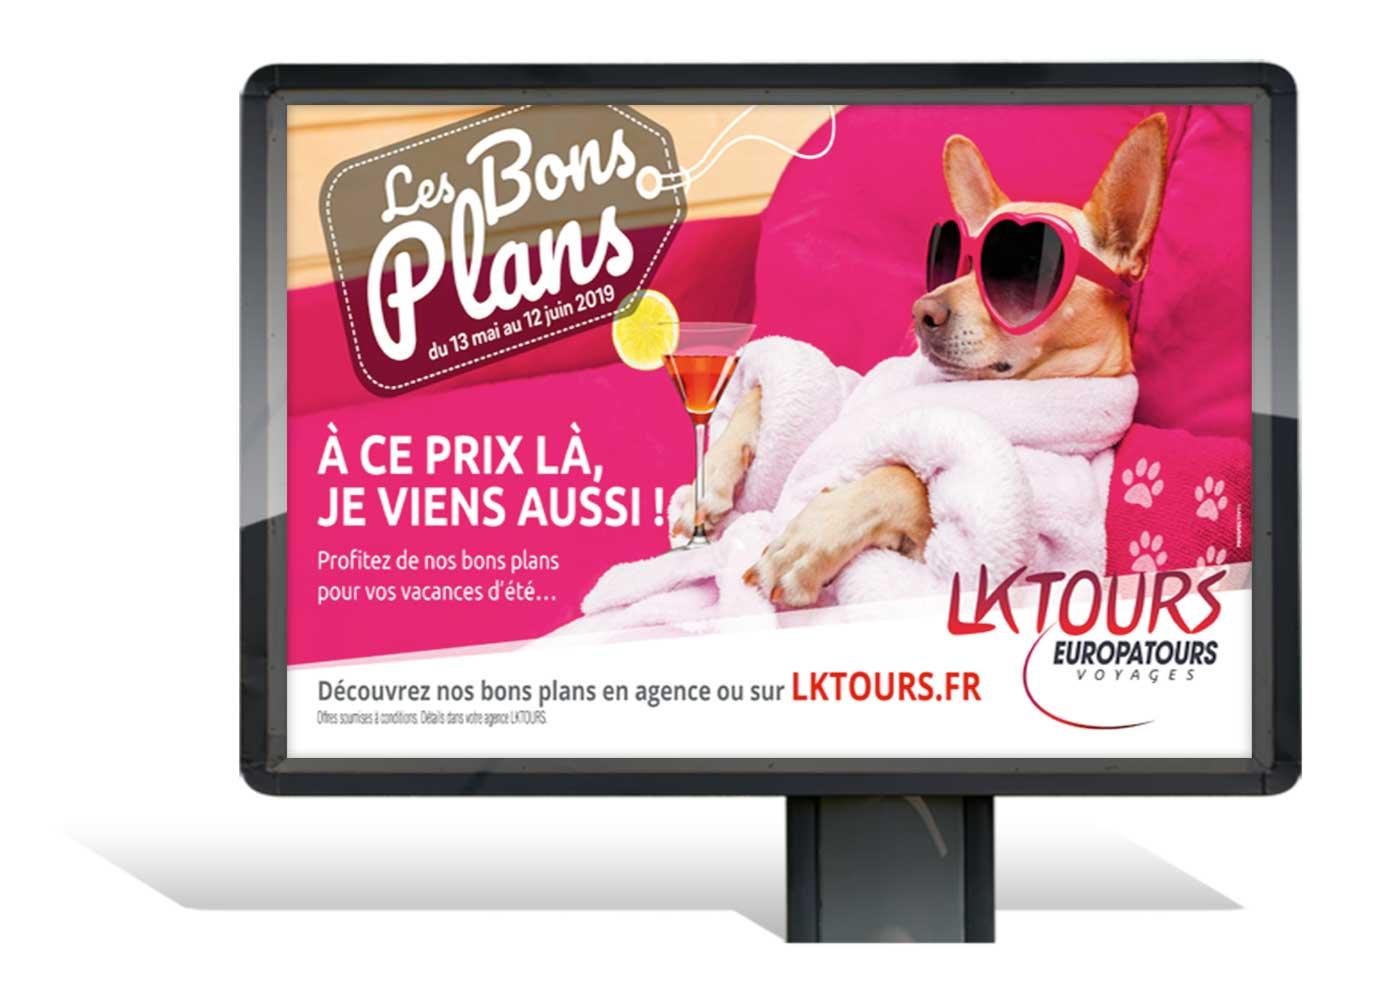 campagne-promotion-bonplan-lktours2